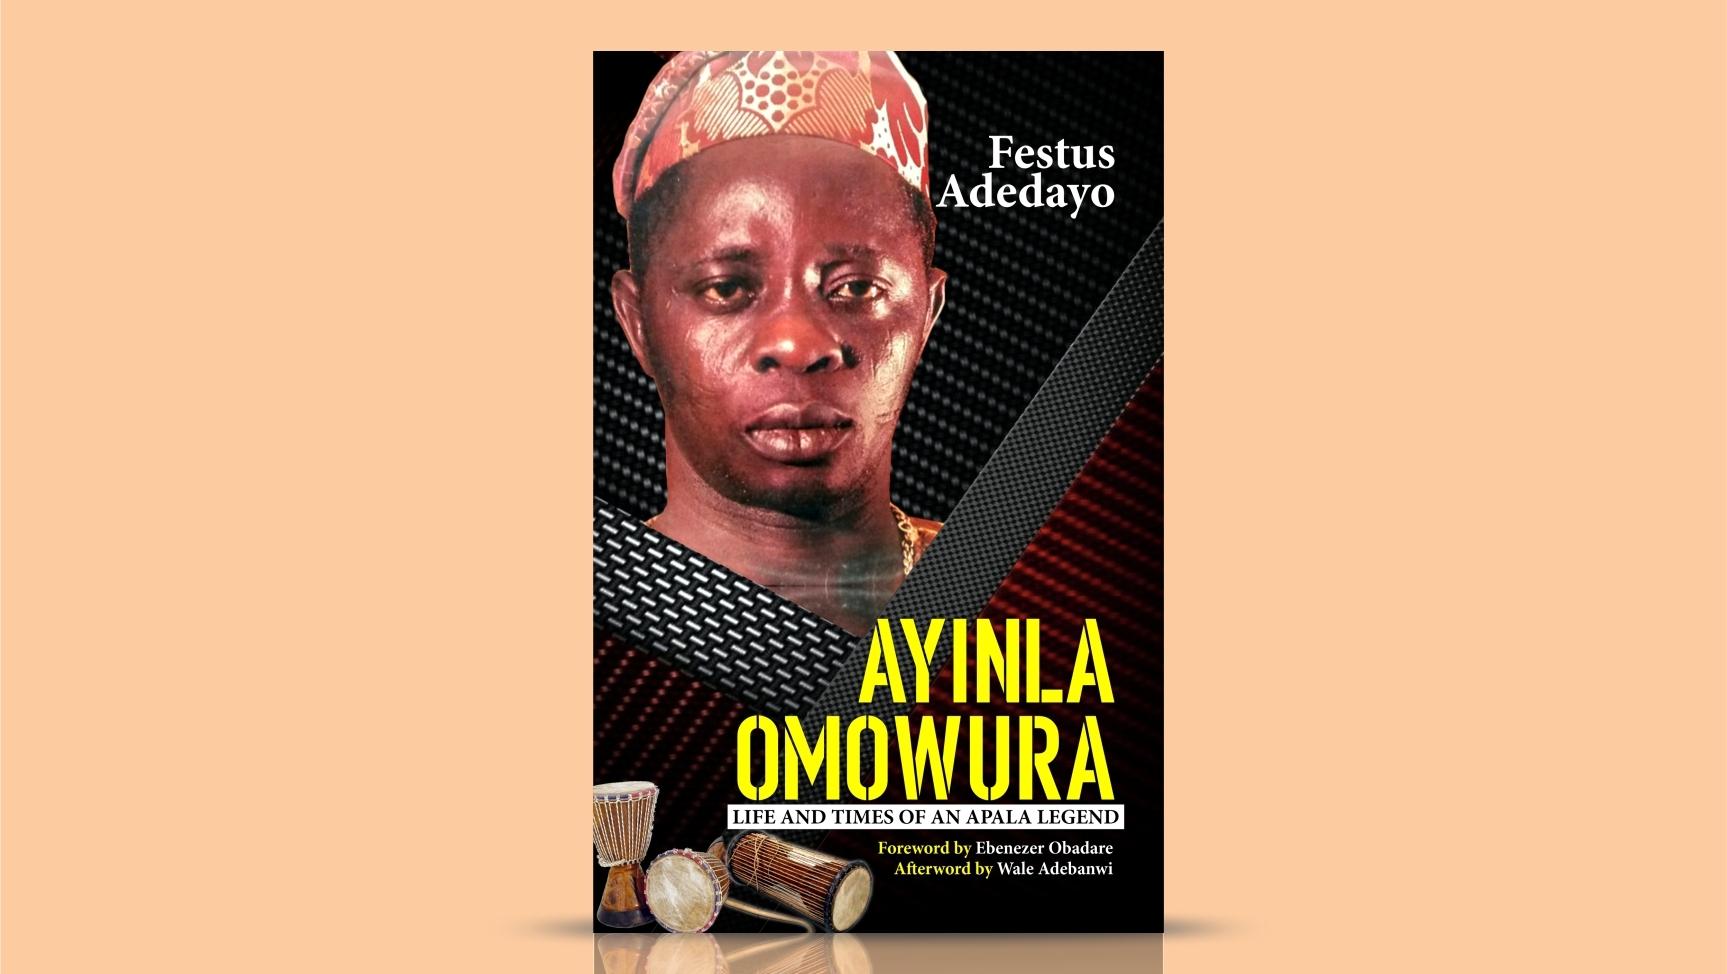 Ayinla Omowura Life and times of an Apala Legend